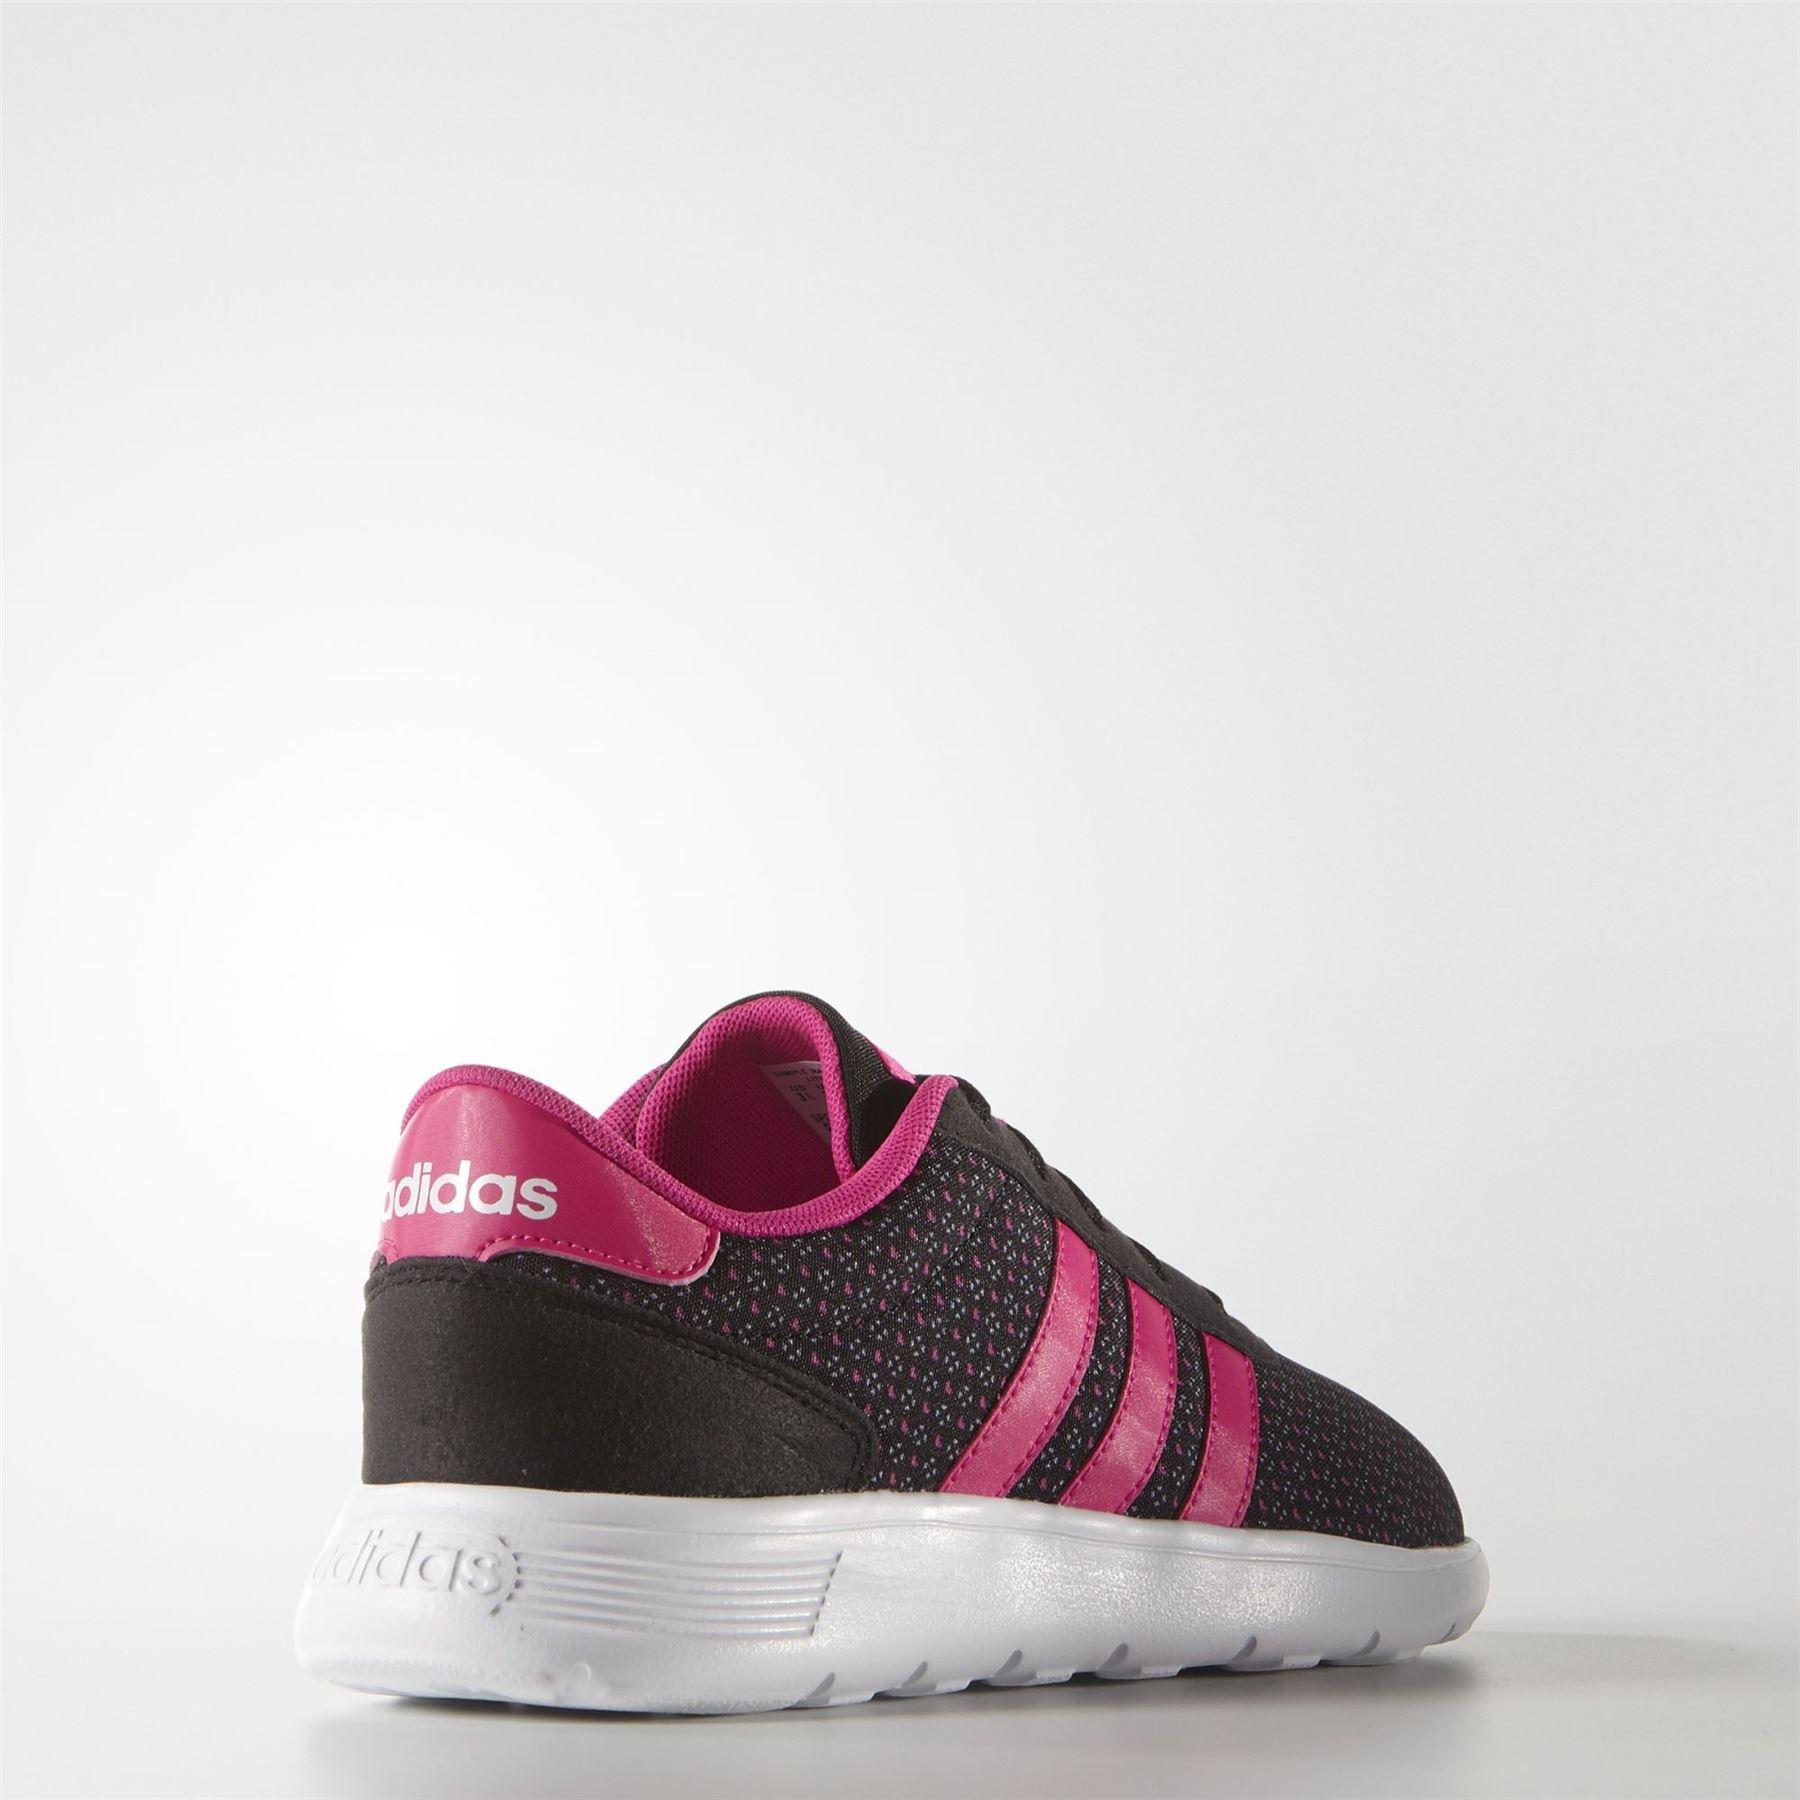 adidas lite racer k aw5122 ragazze nere / rosa uk 3 6 ebay